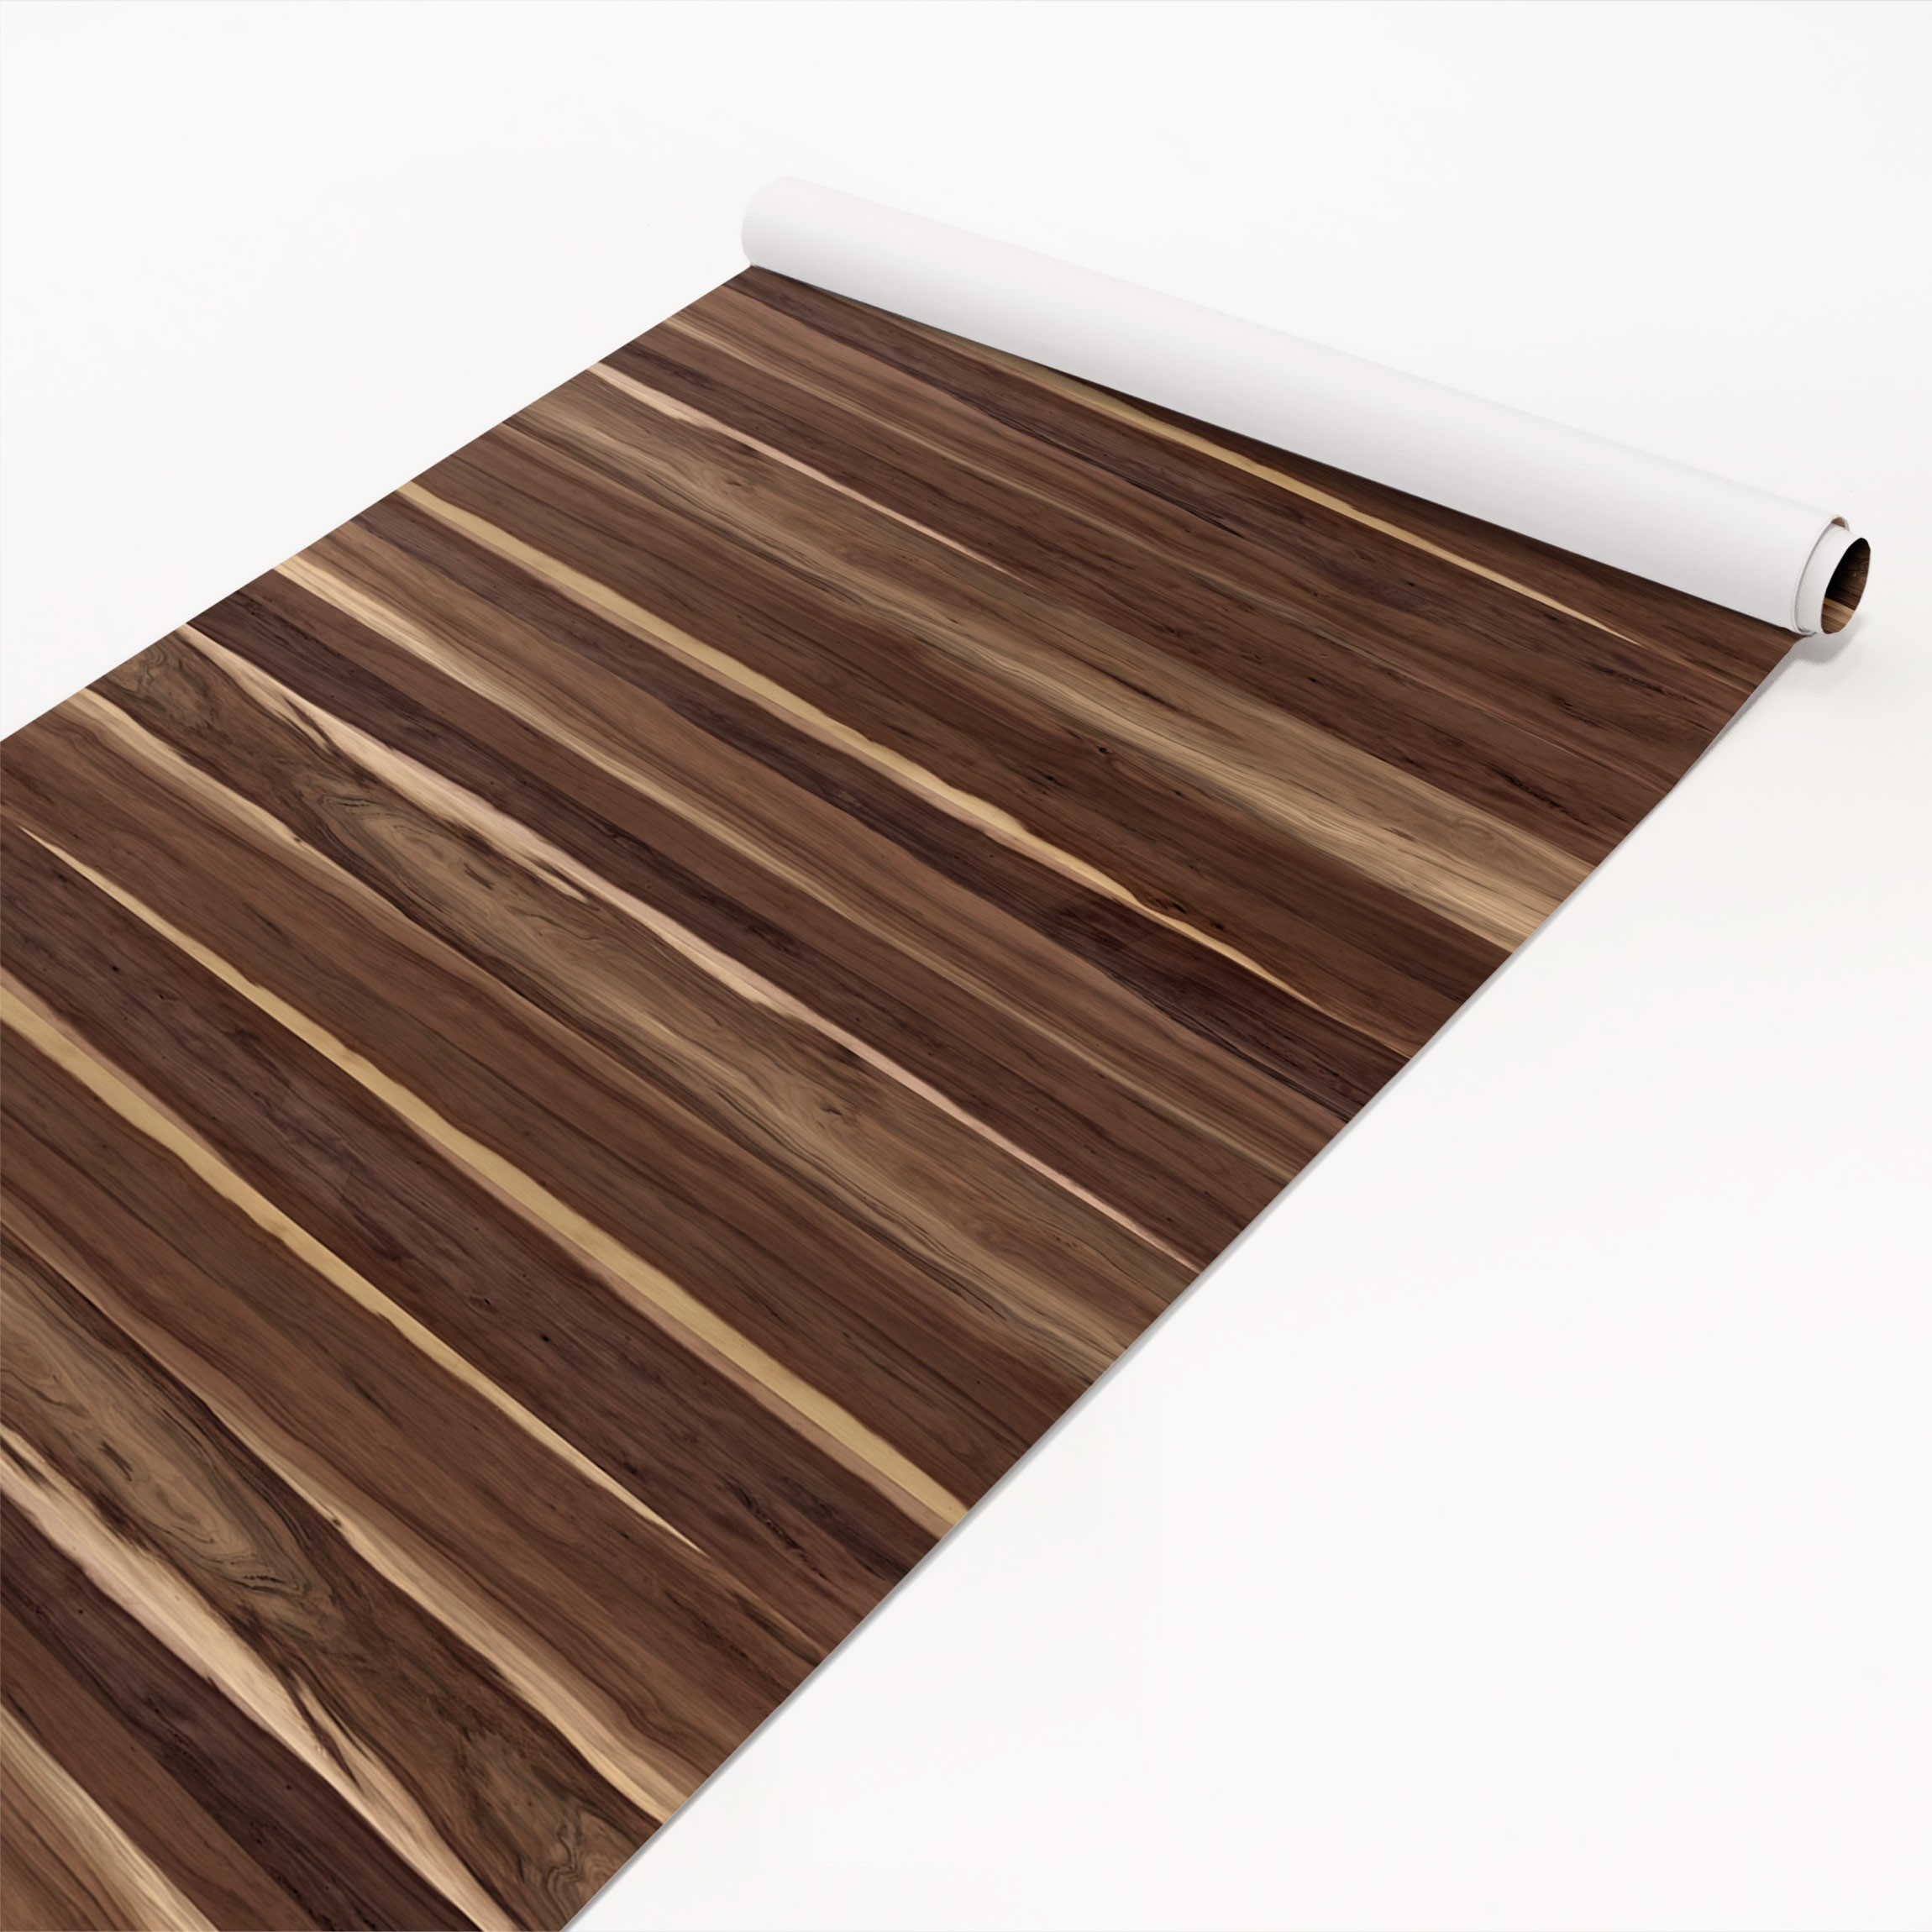 klebefolie holzdekor manio holz folie selbstklebend. Black Bedroom Furniture Sets. Home Design Ideas